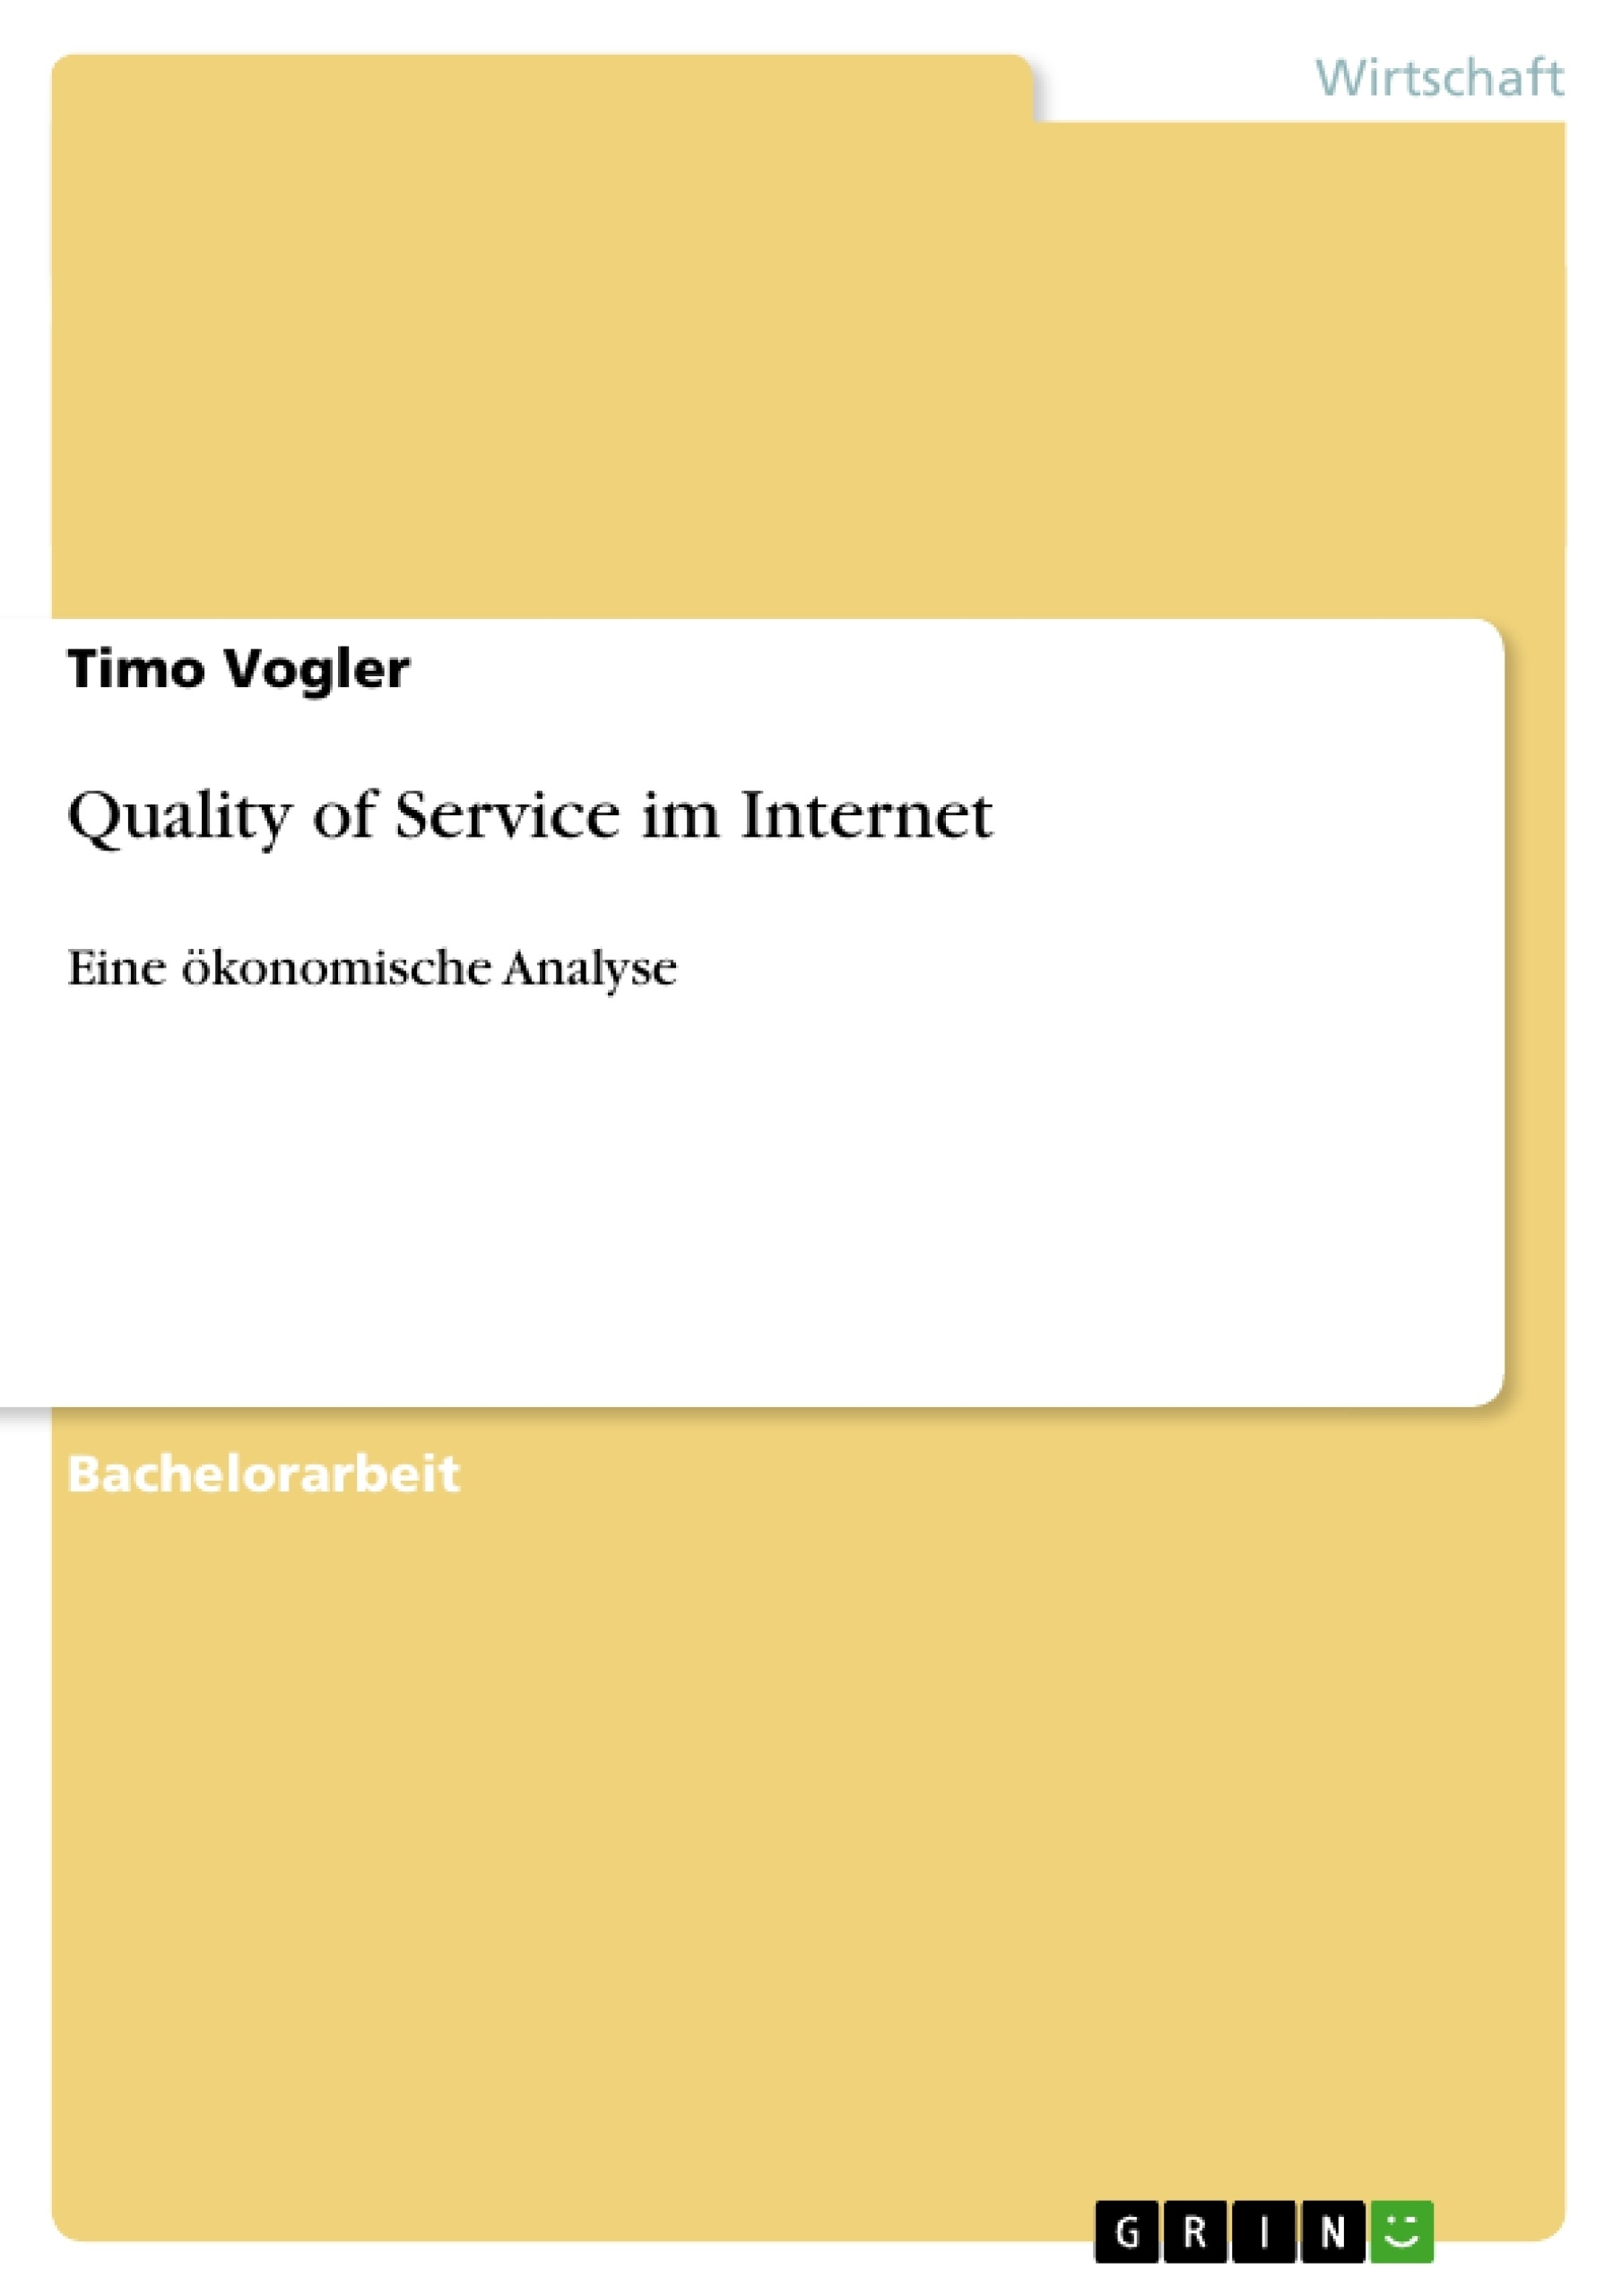 Titel: Quality of Service im Internet